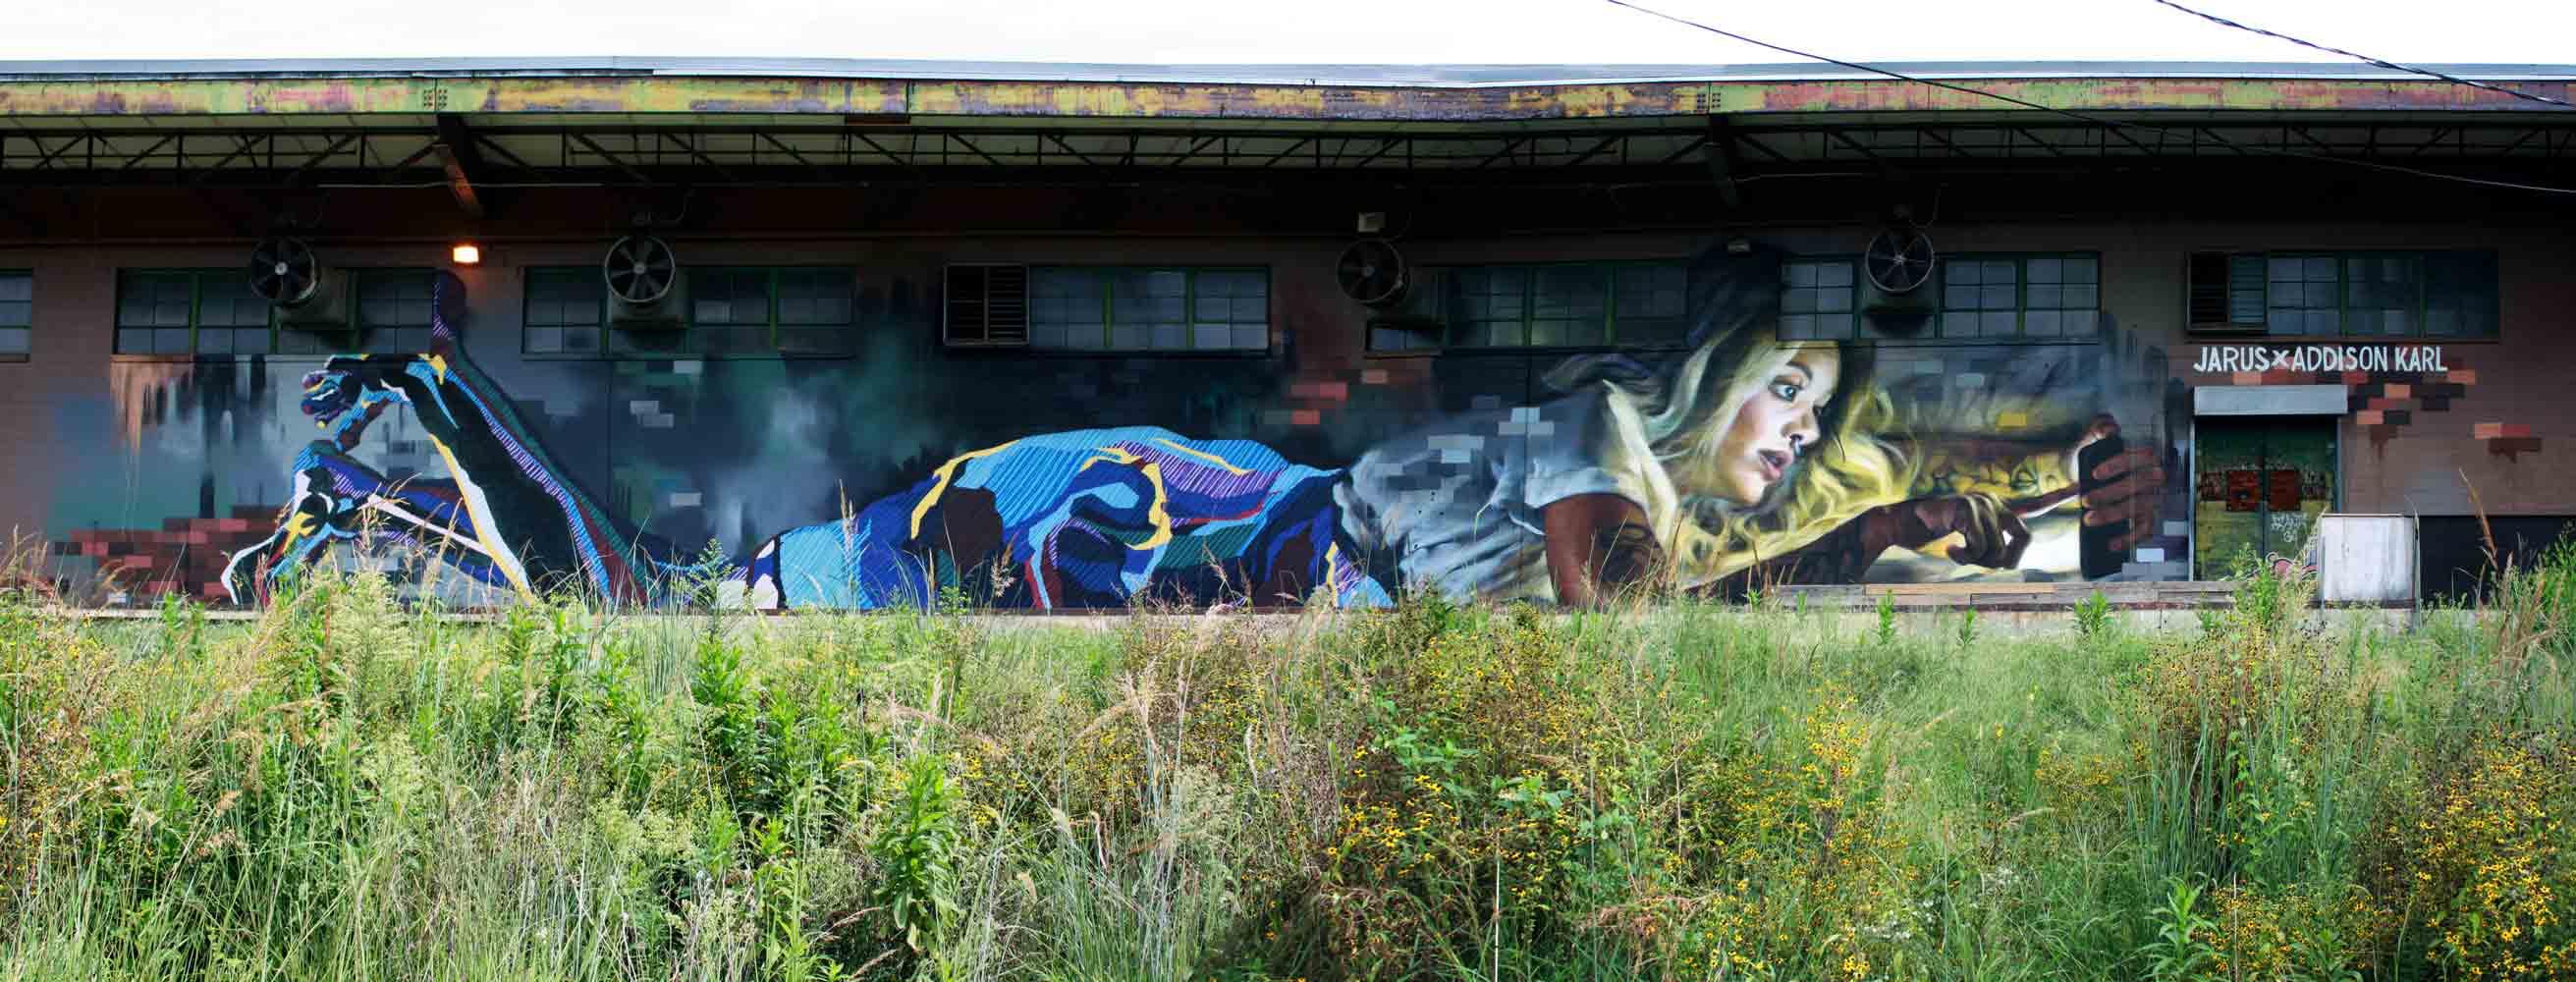 brooklyn-street-art-karl-addison-jarus-atlanta-09-15-web-6